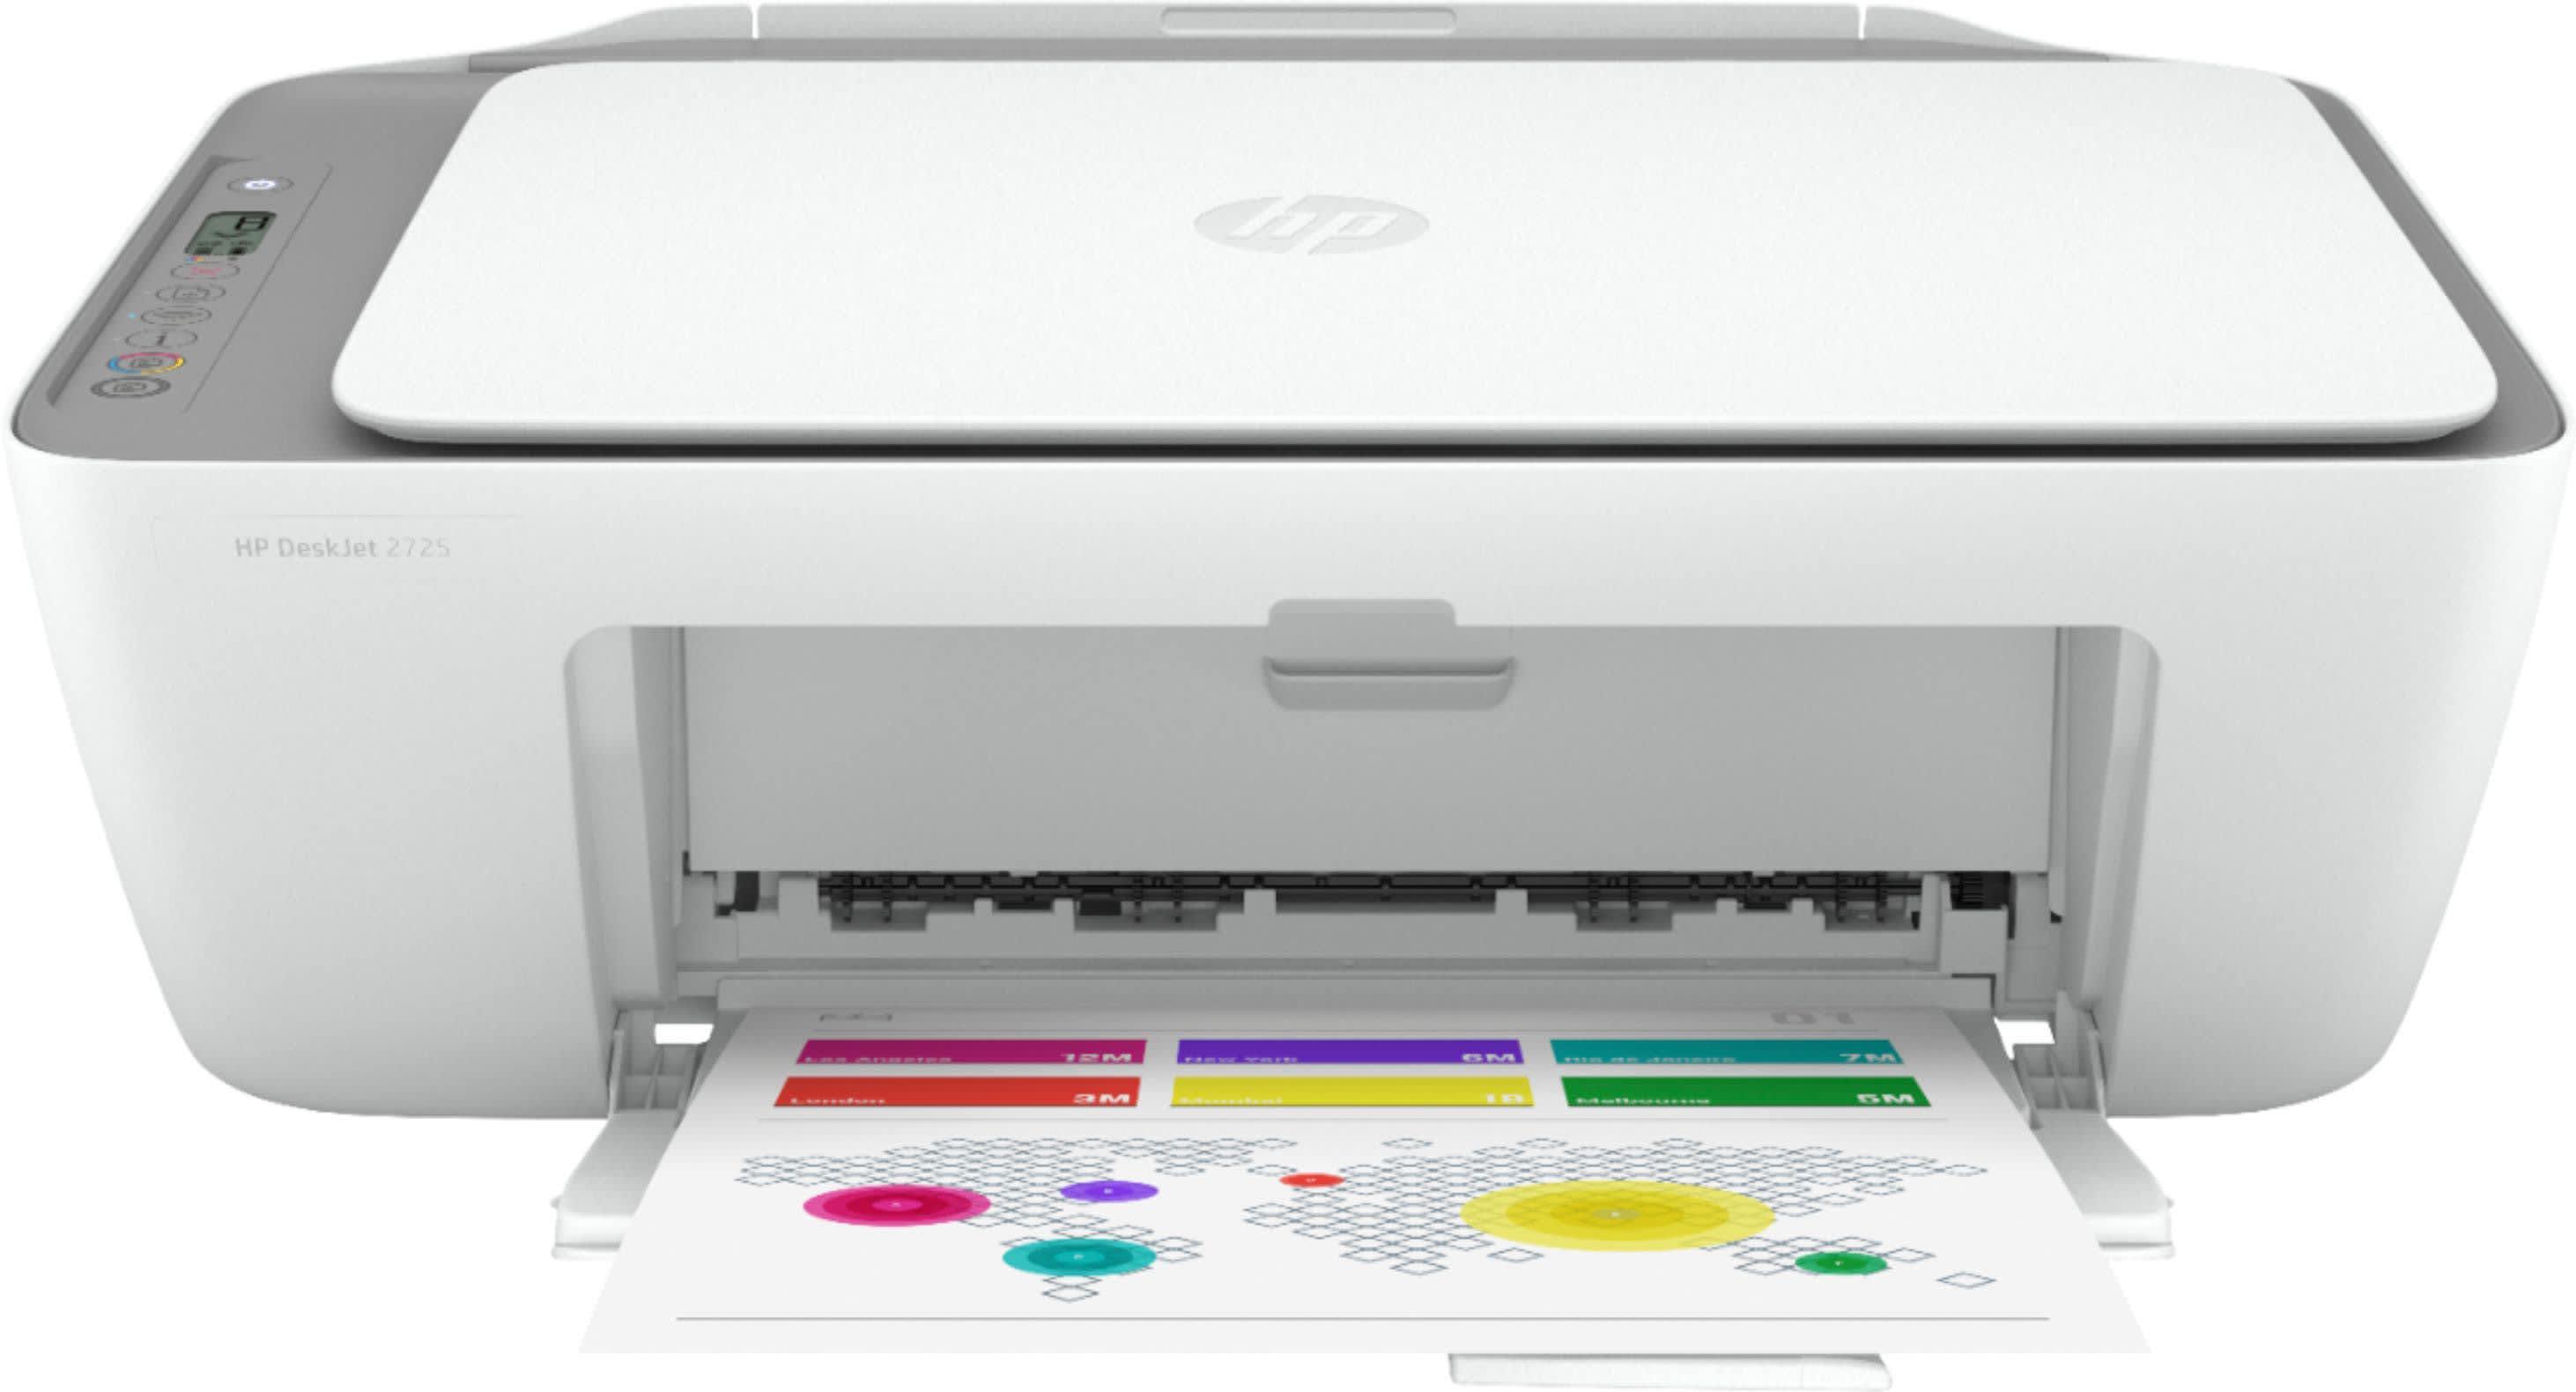 HP DeskJet 2725 All-in-One Wireless Inkjet Printer